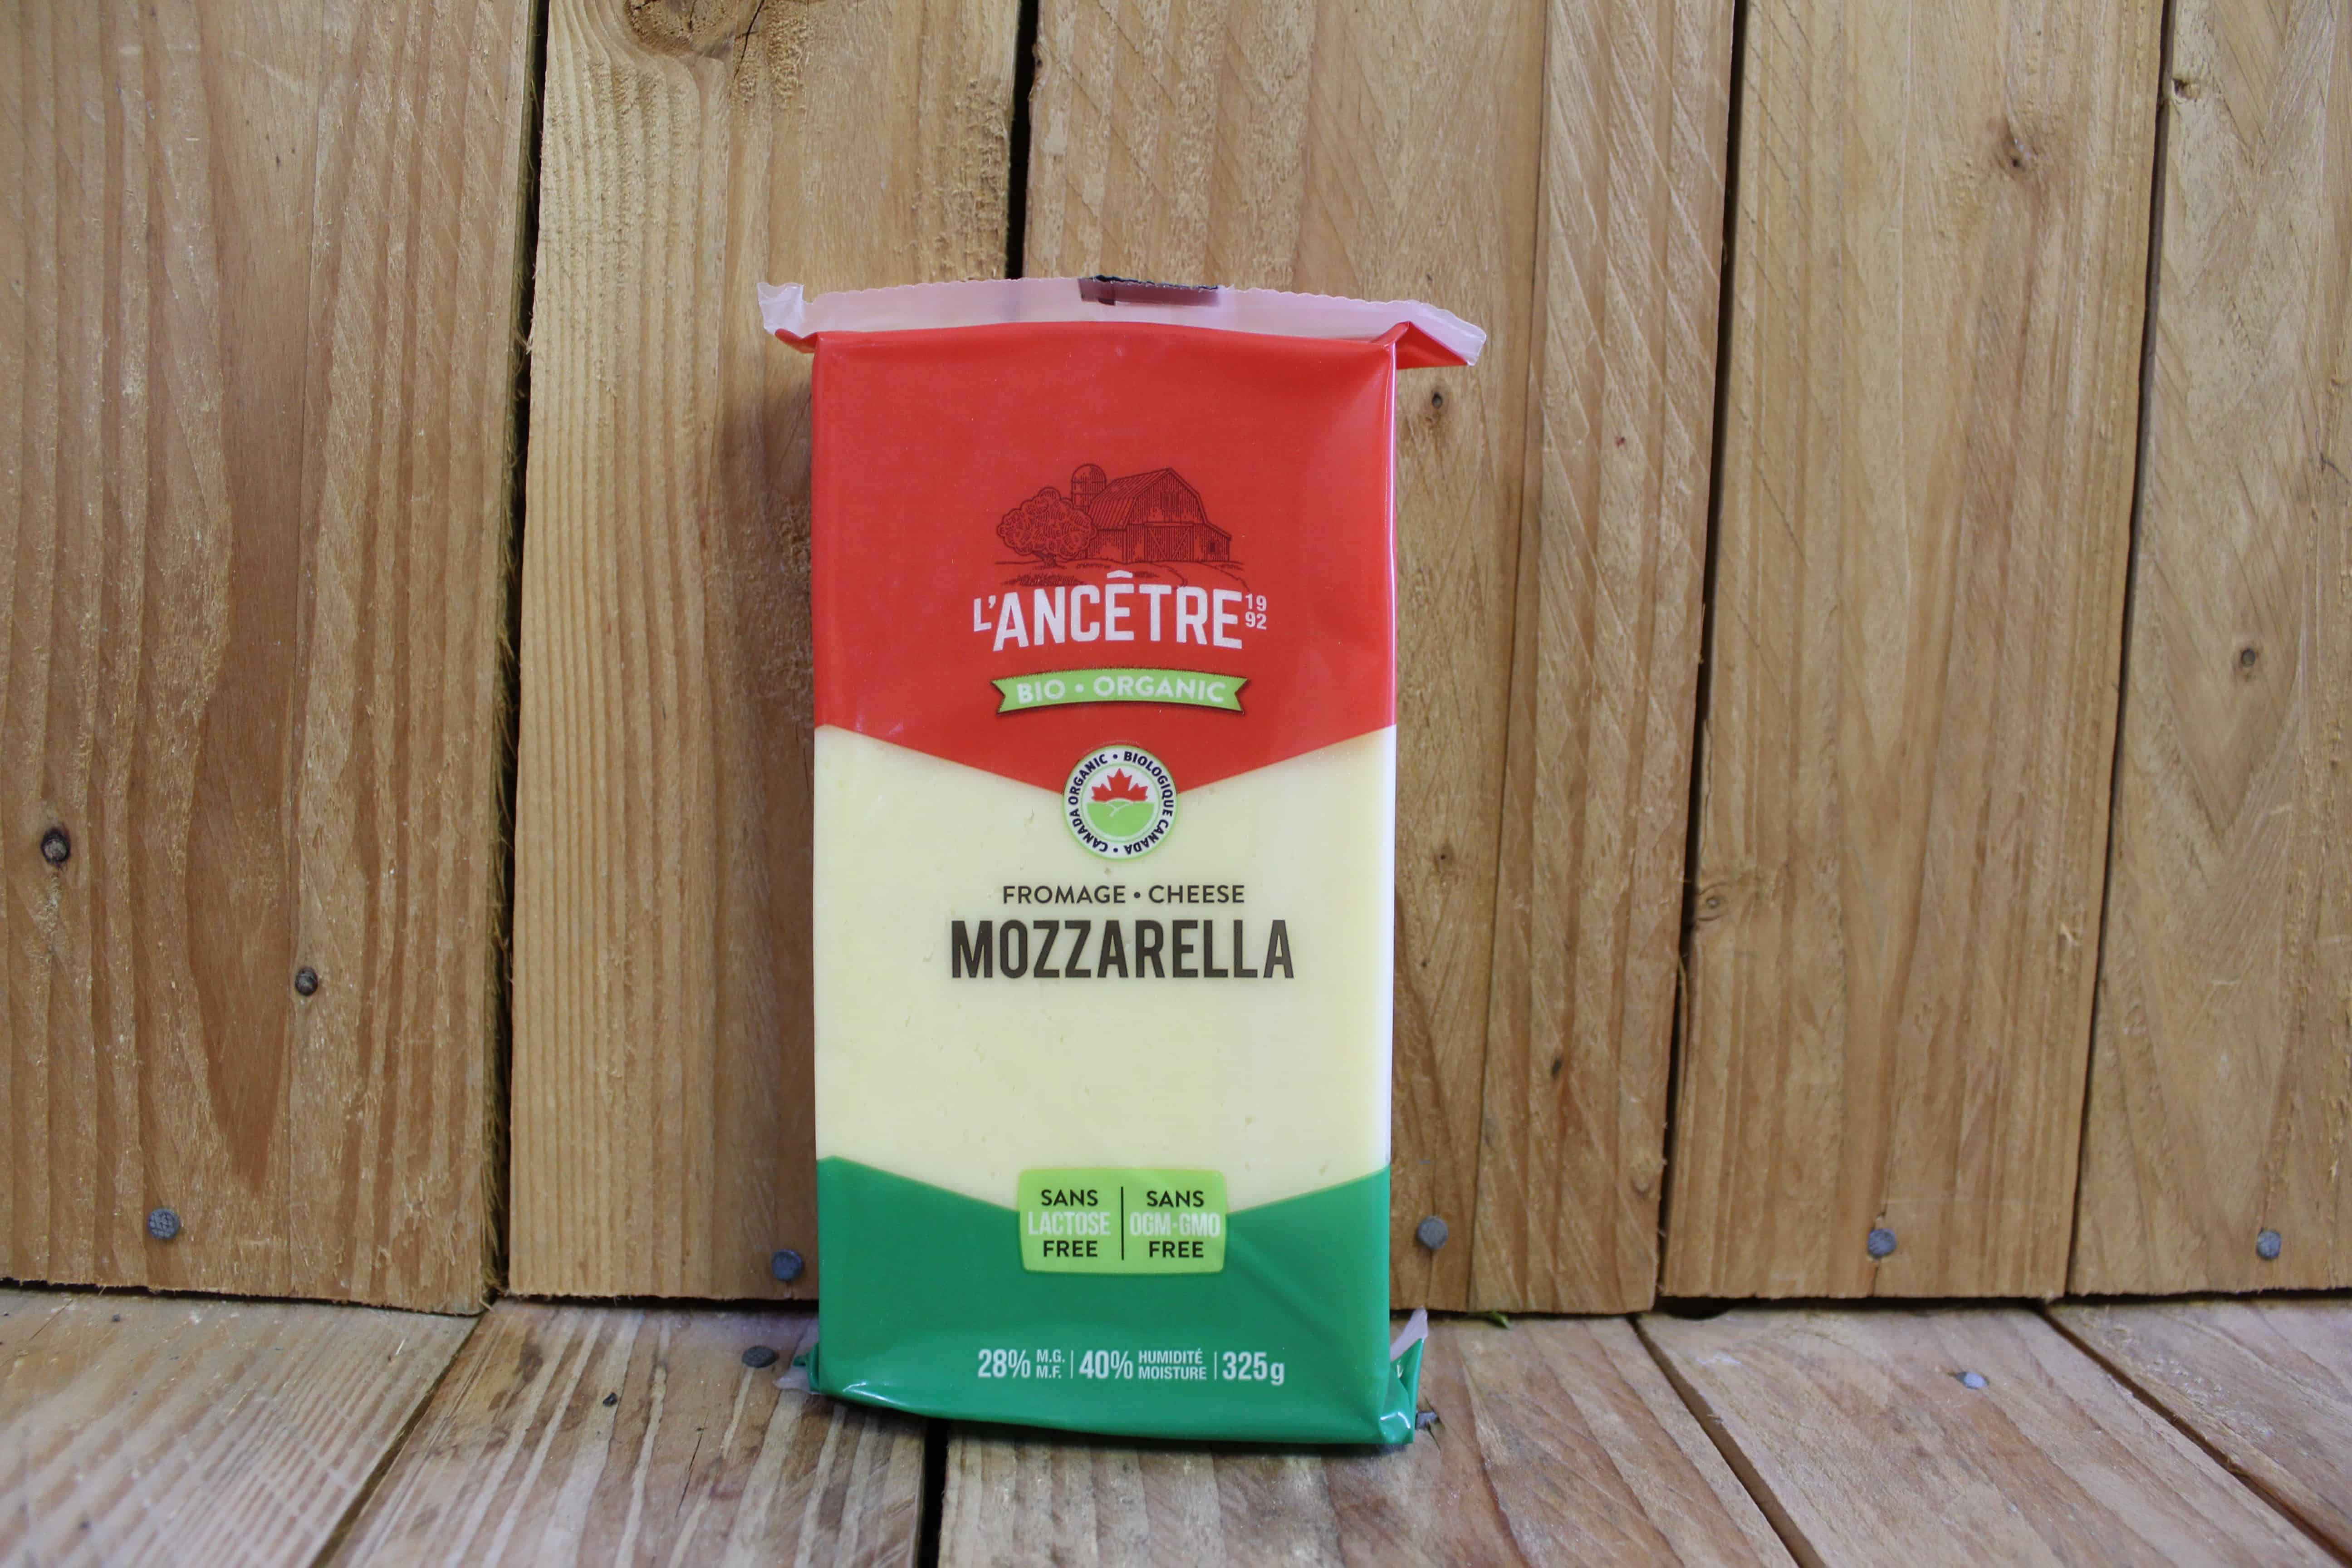 L'Ancetre – Mozzarella 28% MF, Lactose-Free (325g)